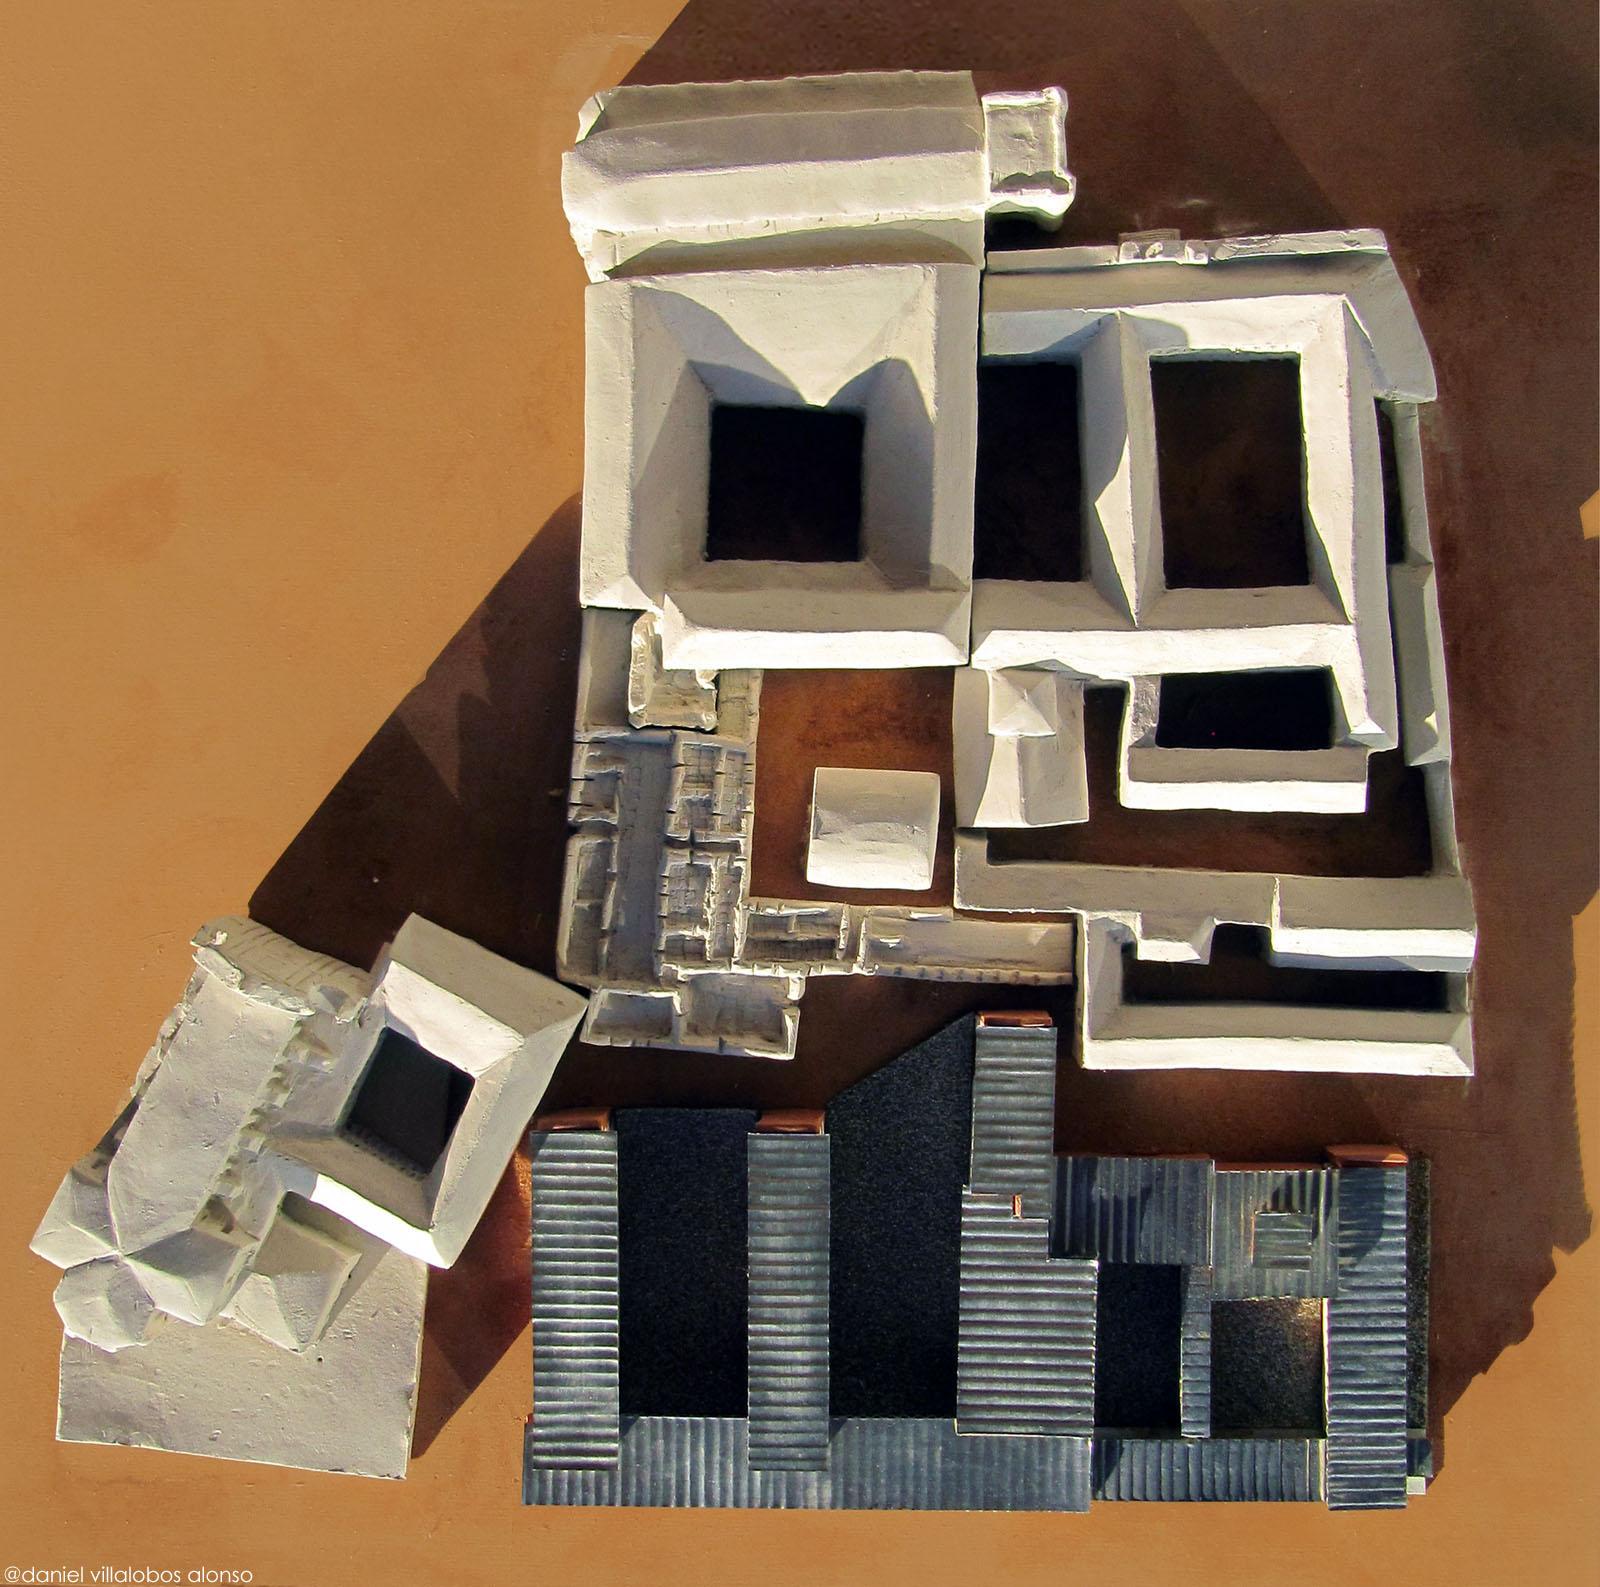 danielvillalobos-huesosfisac-miguelfisac-modernarchitecture-3